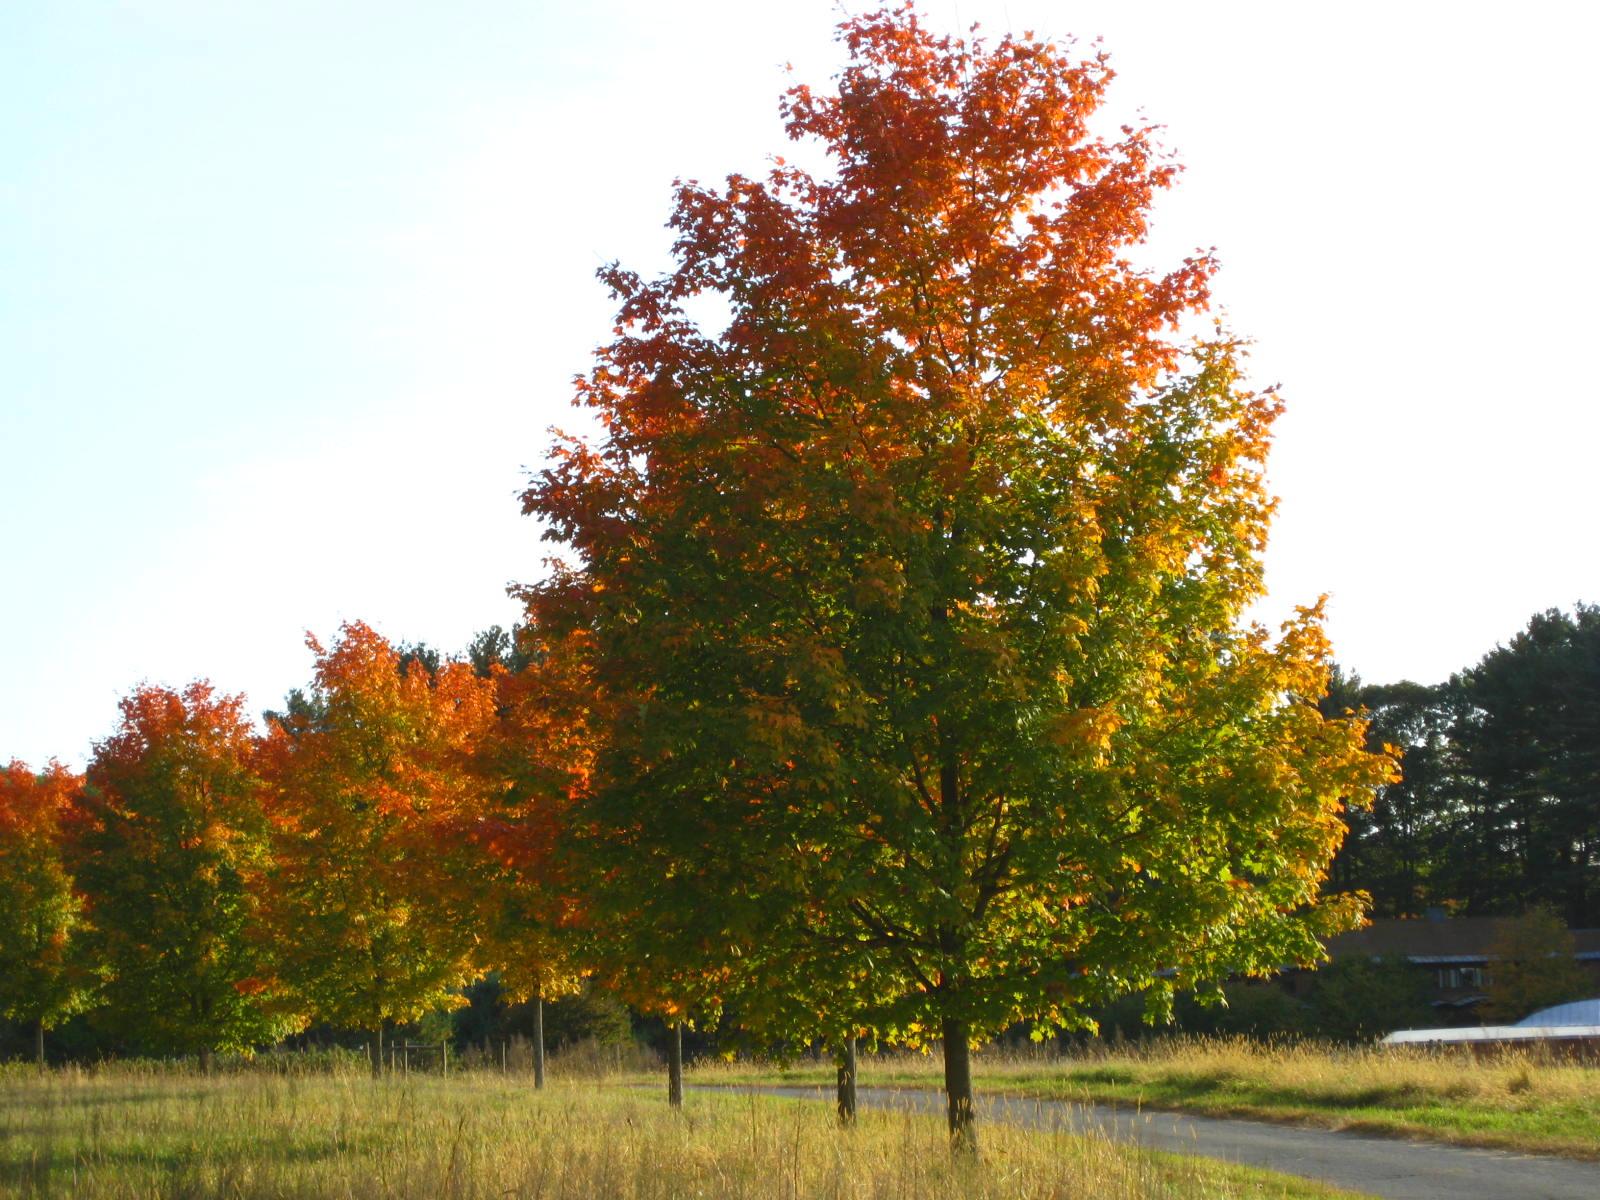 Traffic light trees 2 10-12-2008